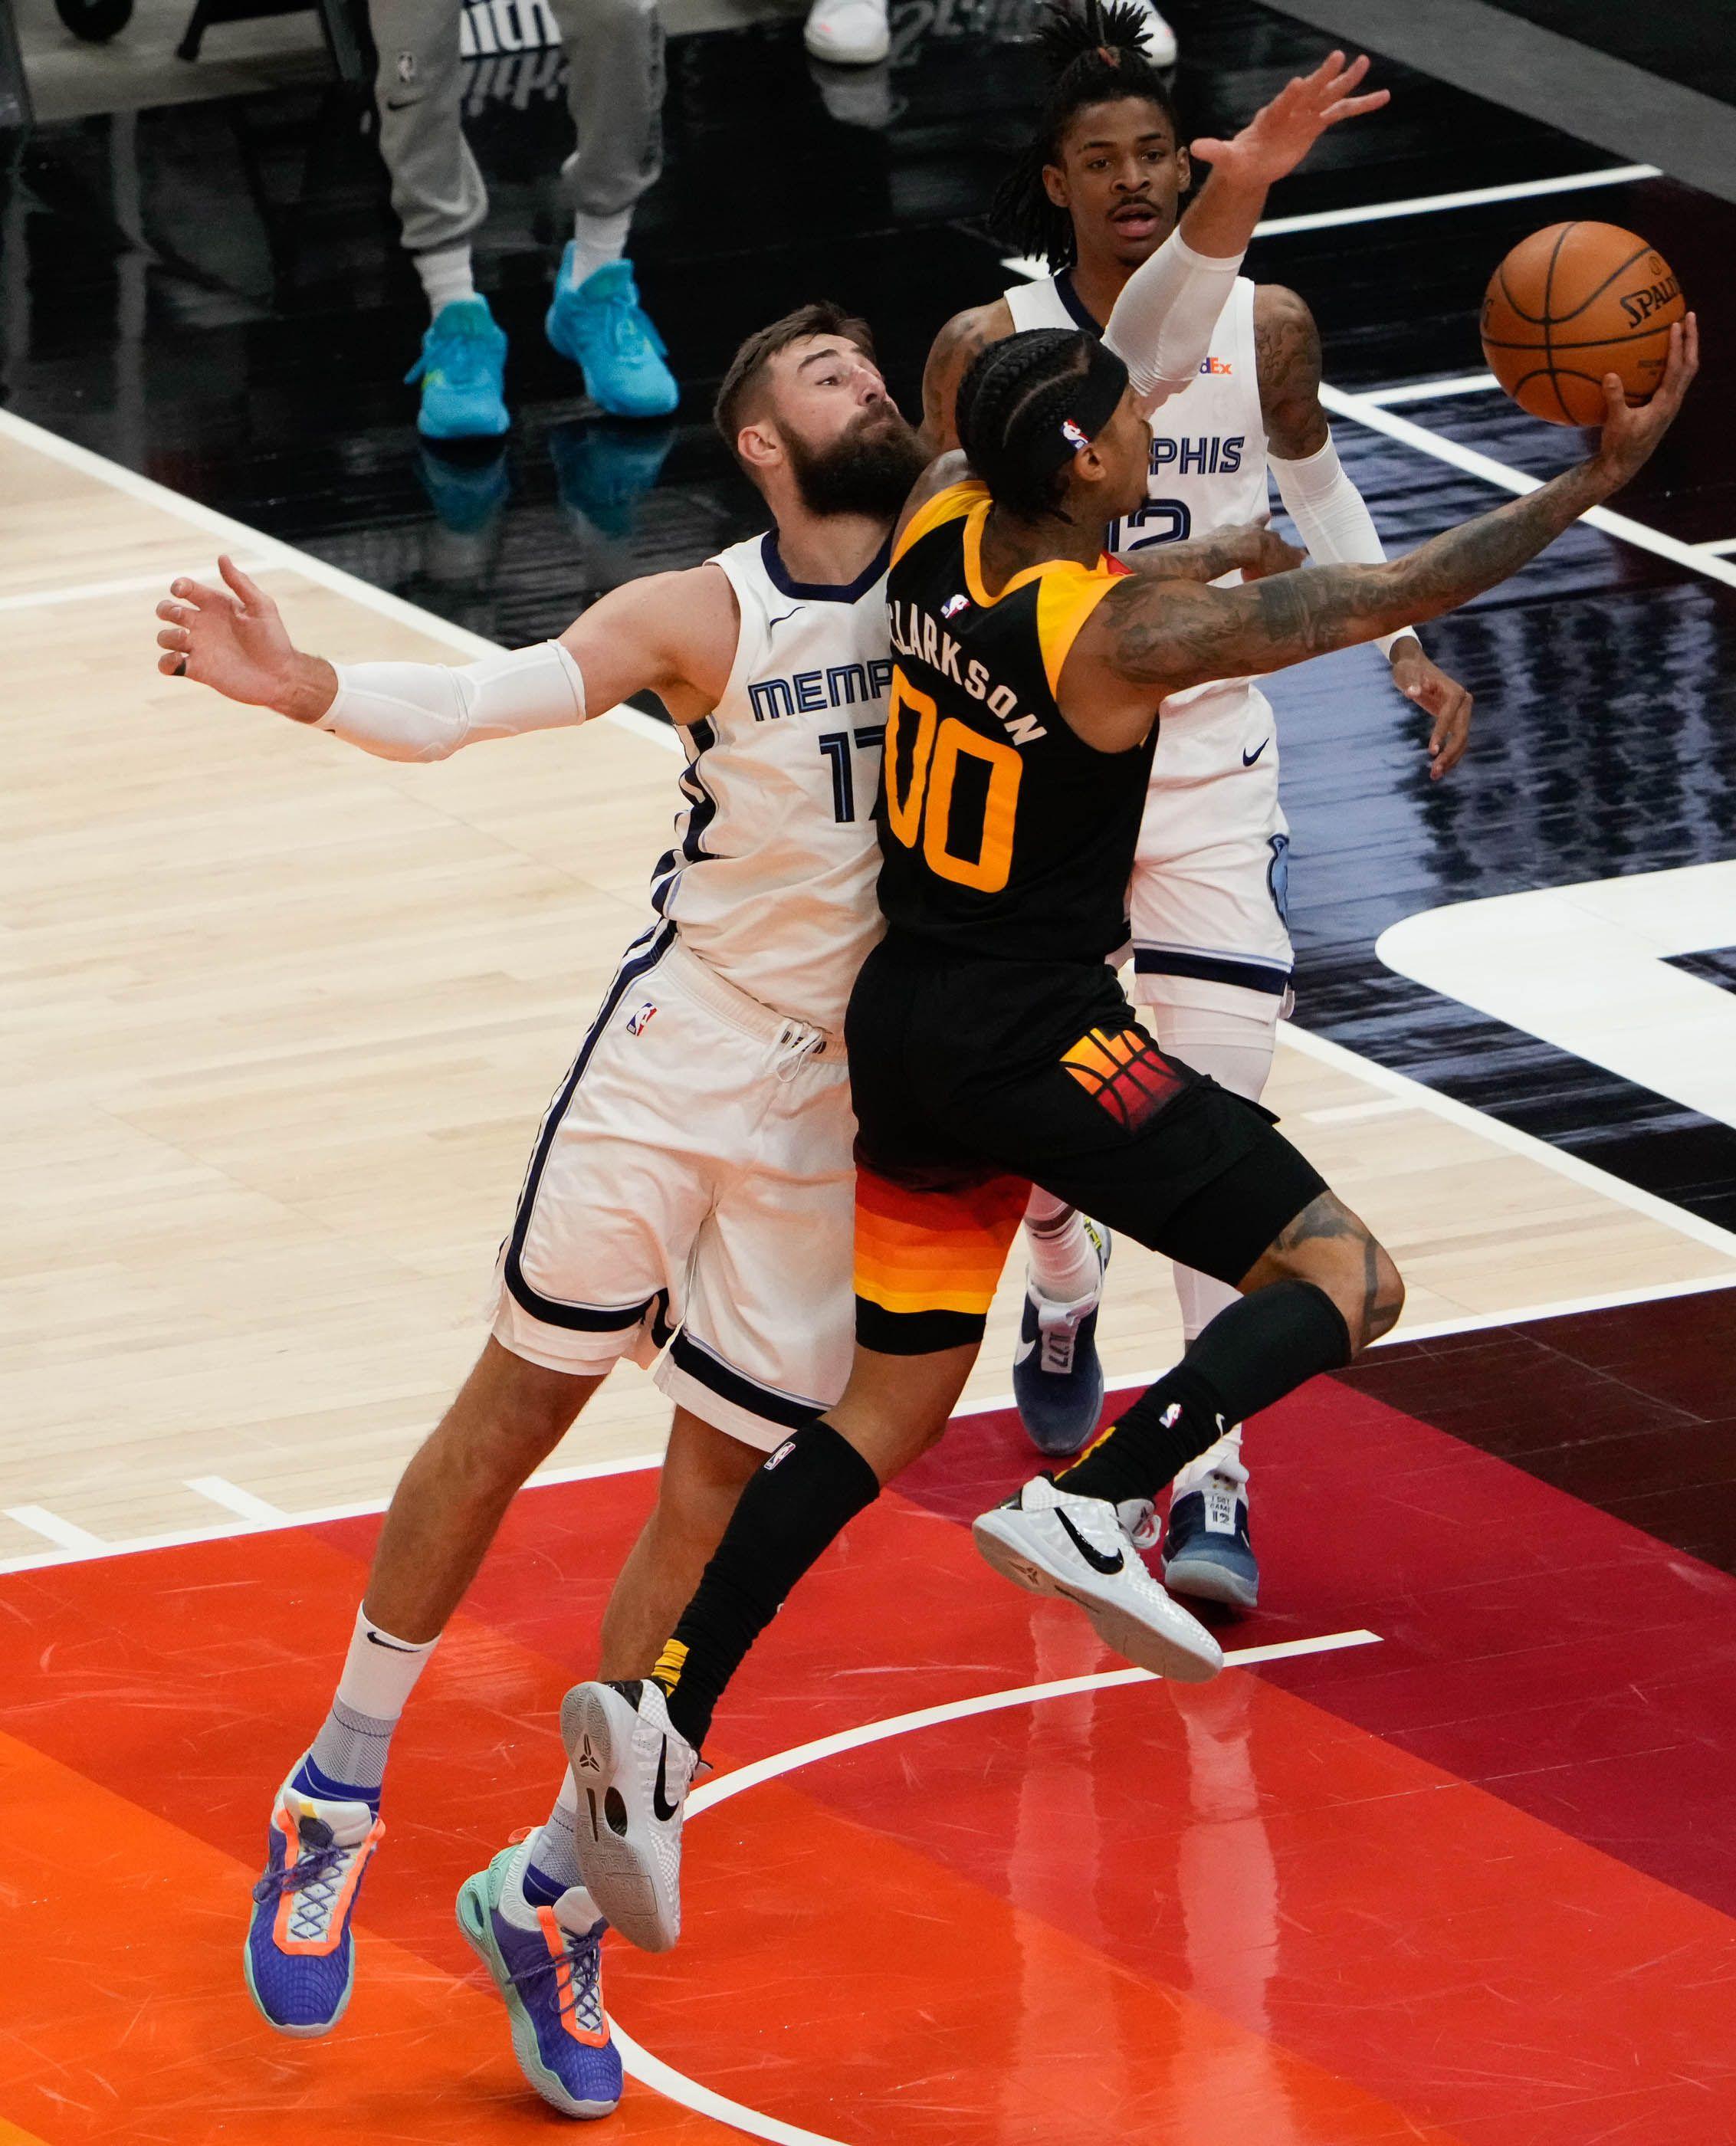 (Francisco Kjolseth | The Salt Lake Tribune) Utah Jazz guard Jordan Clarkson (00) lays one up past Memphis Grizzlies center Jonas Valanciunas (17) in the first half of Game 5 of an NBA basketball first-round playoff series Wednesday, June 2, 2021, in Salt Lake City, UT.